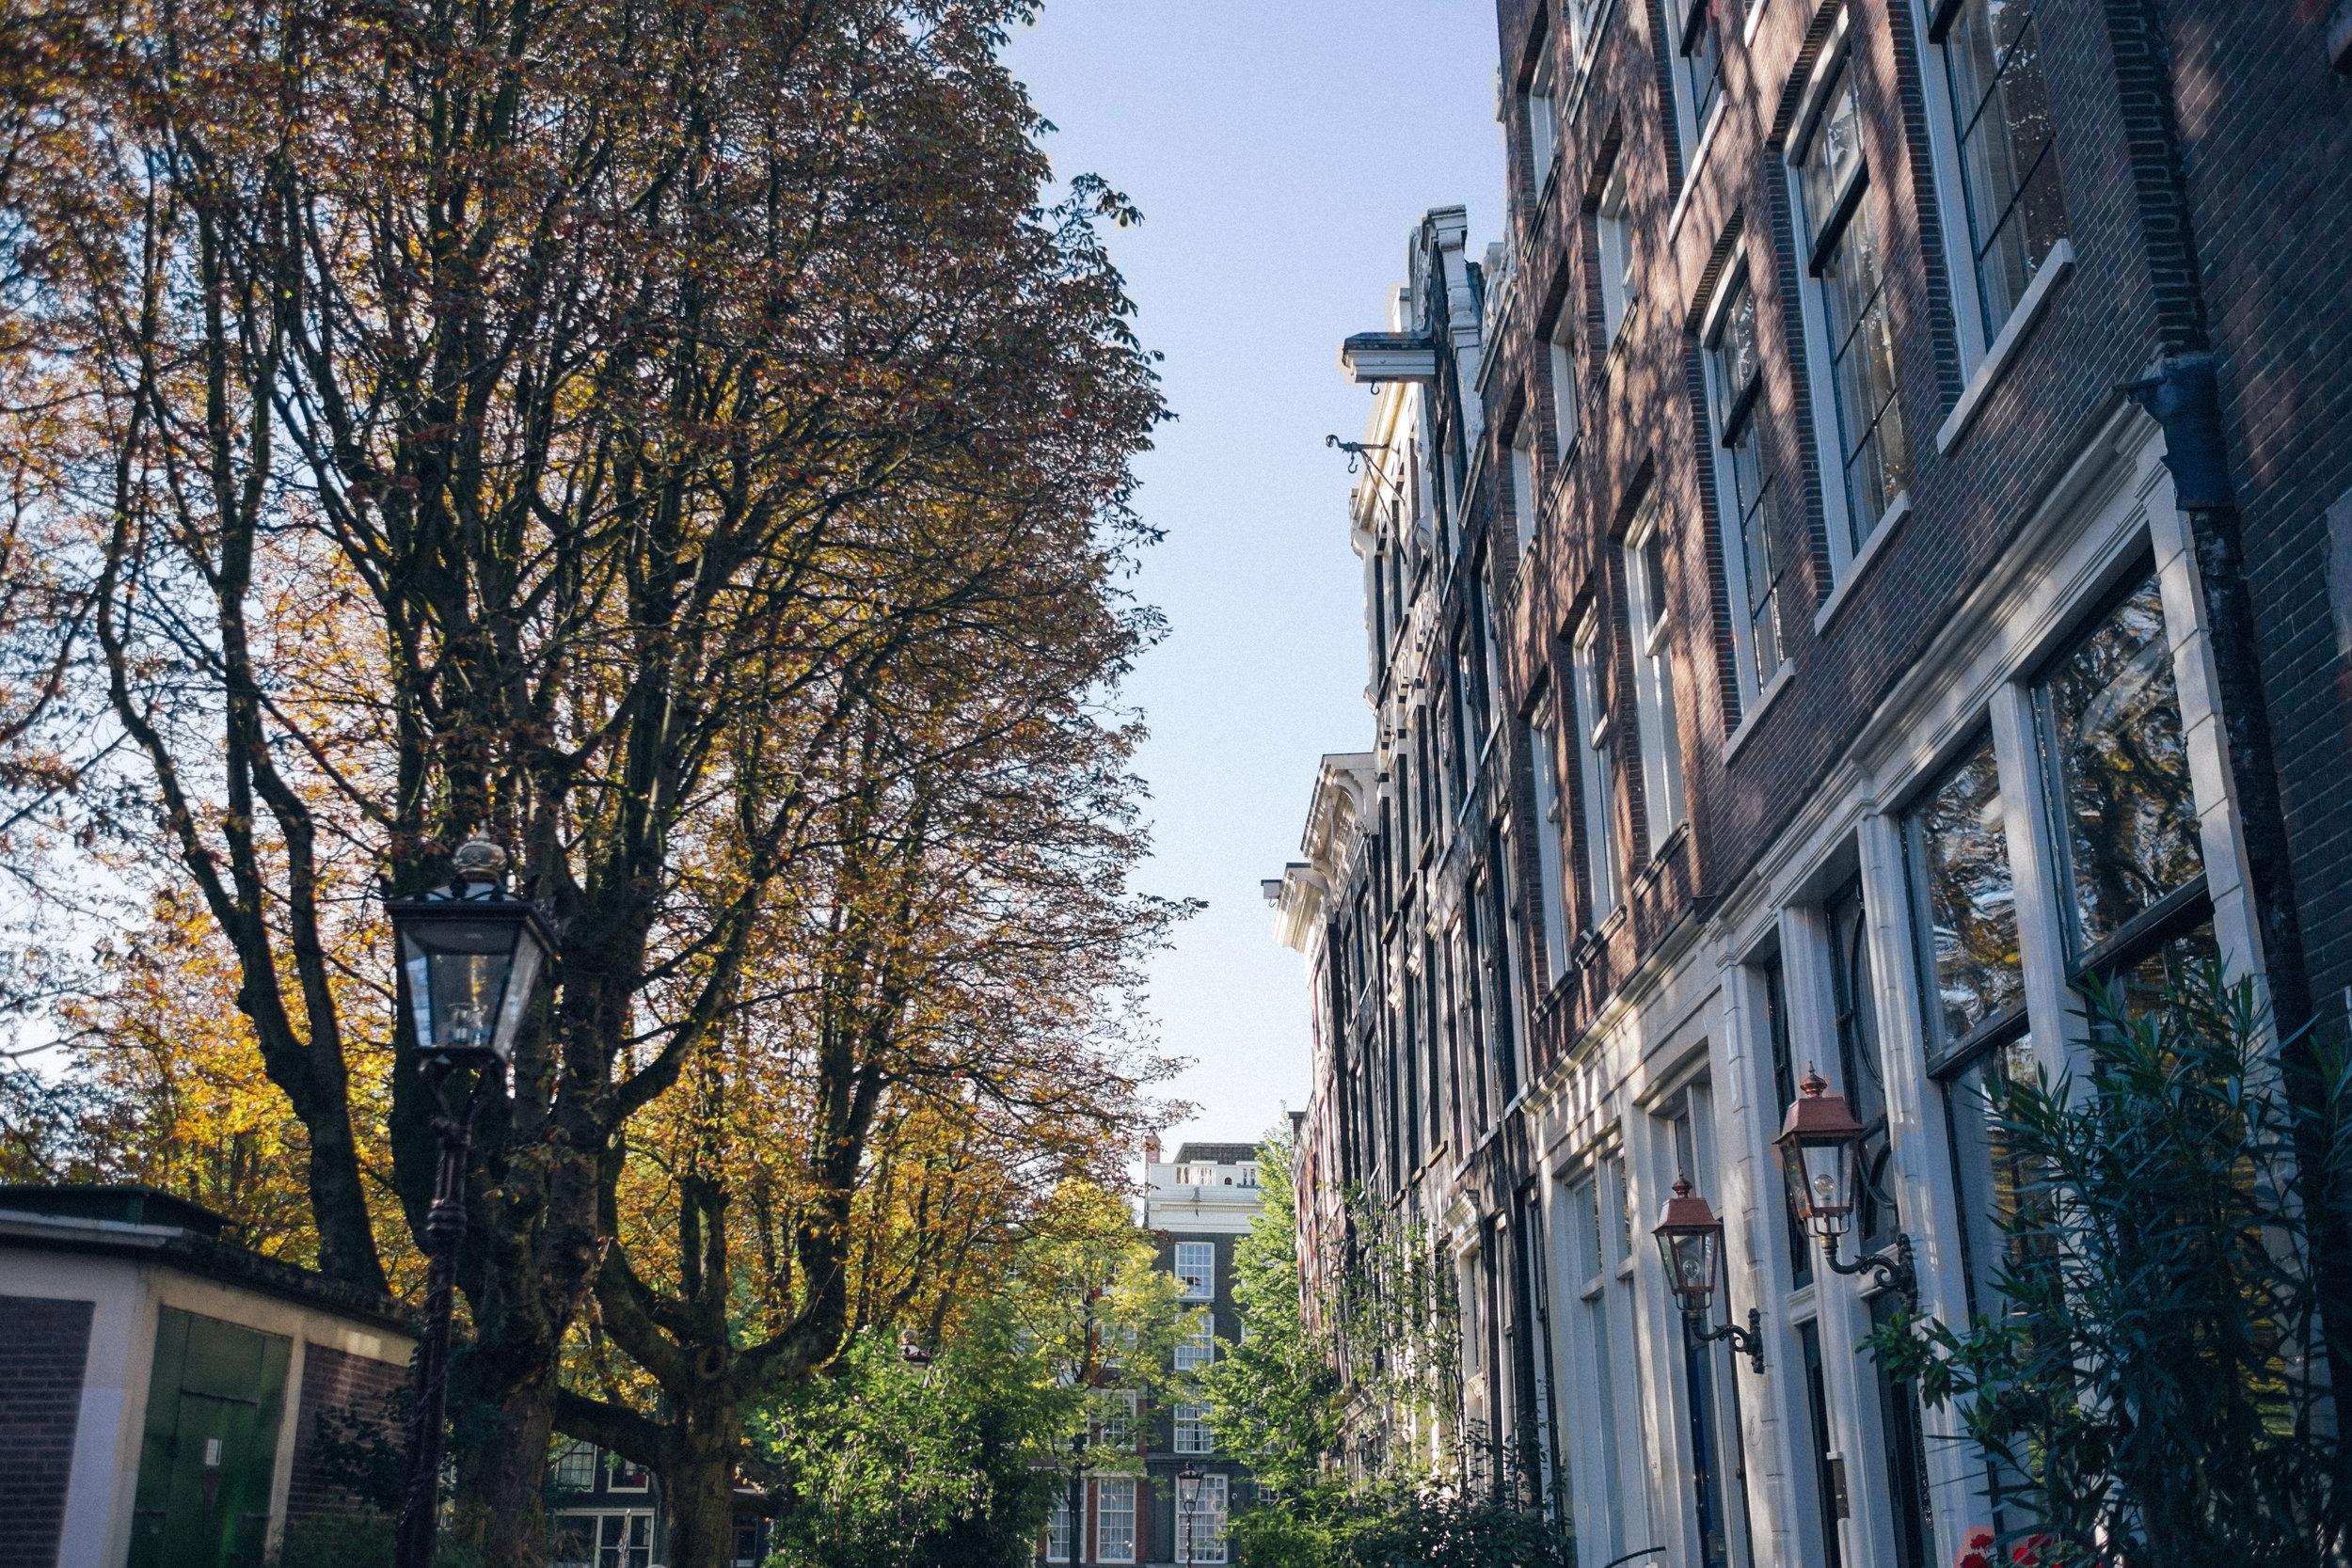 amsterdam-59.jpg